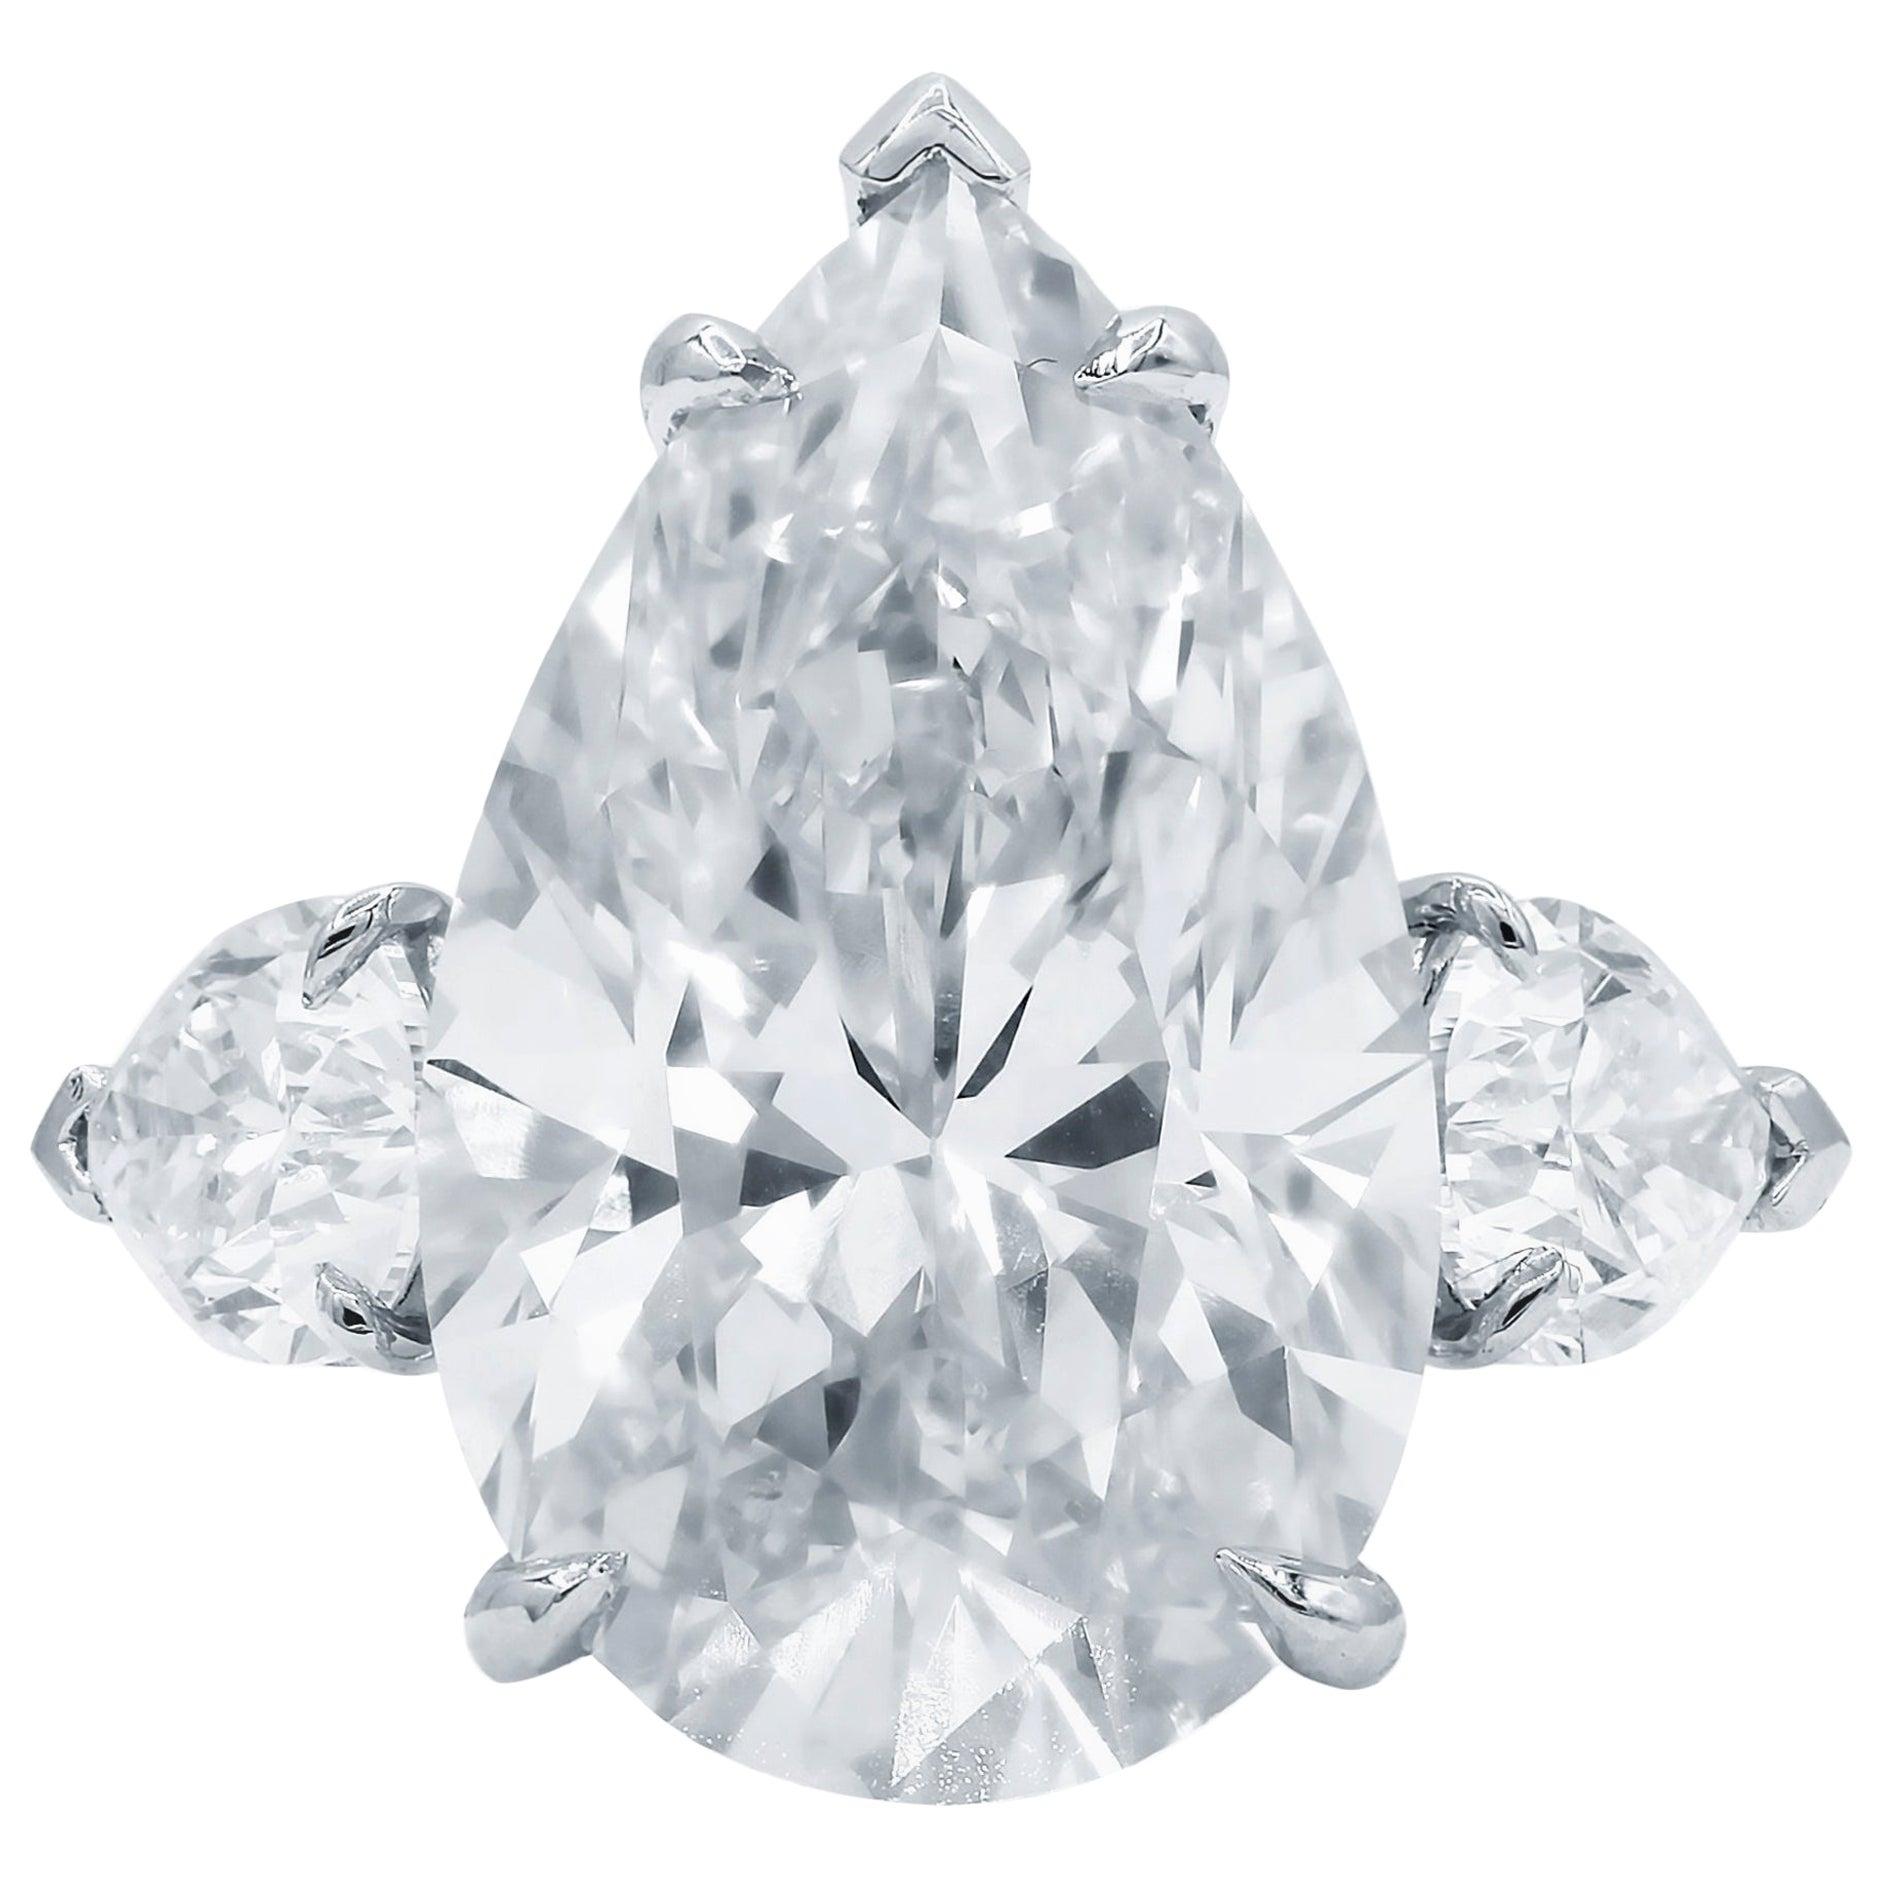 GIA Certified 4.50 Carat Pear Cut Diamond Platinum Ring G Color VVS2 Clarity